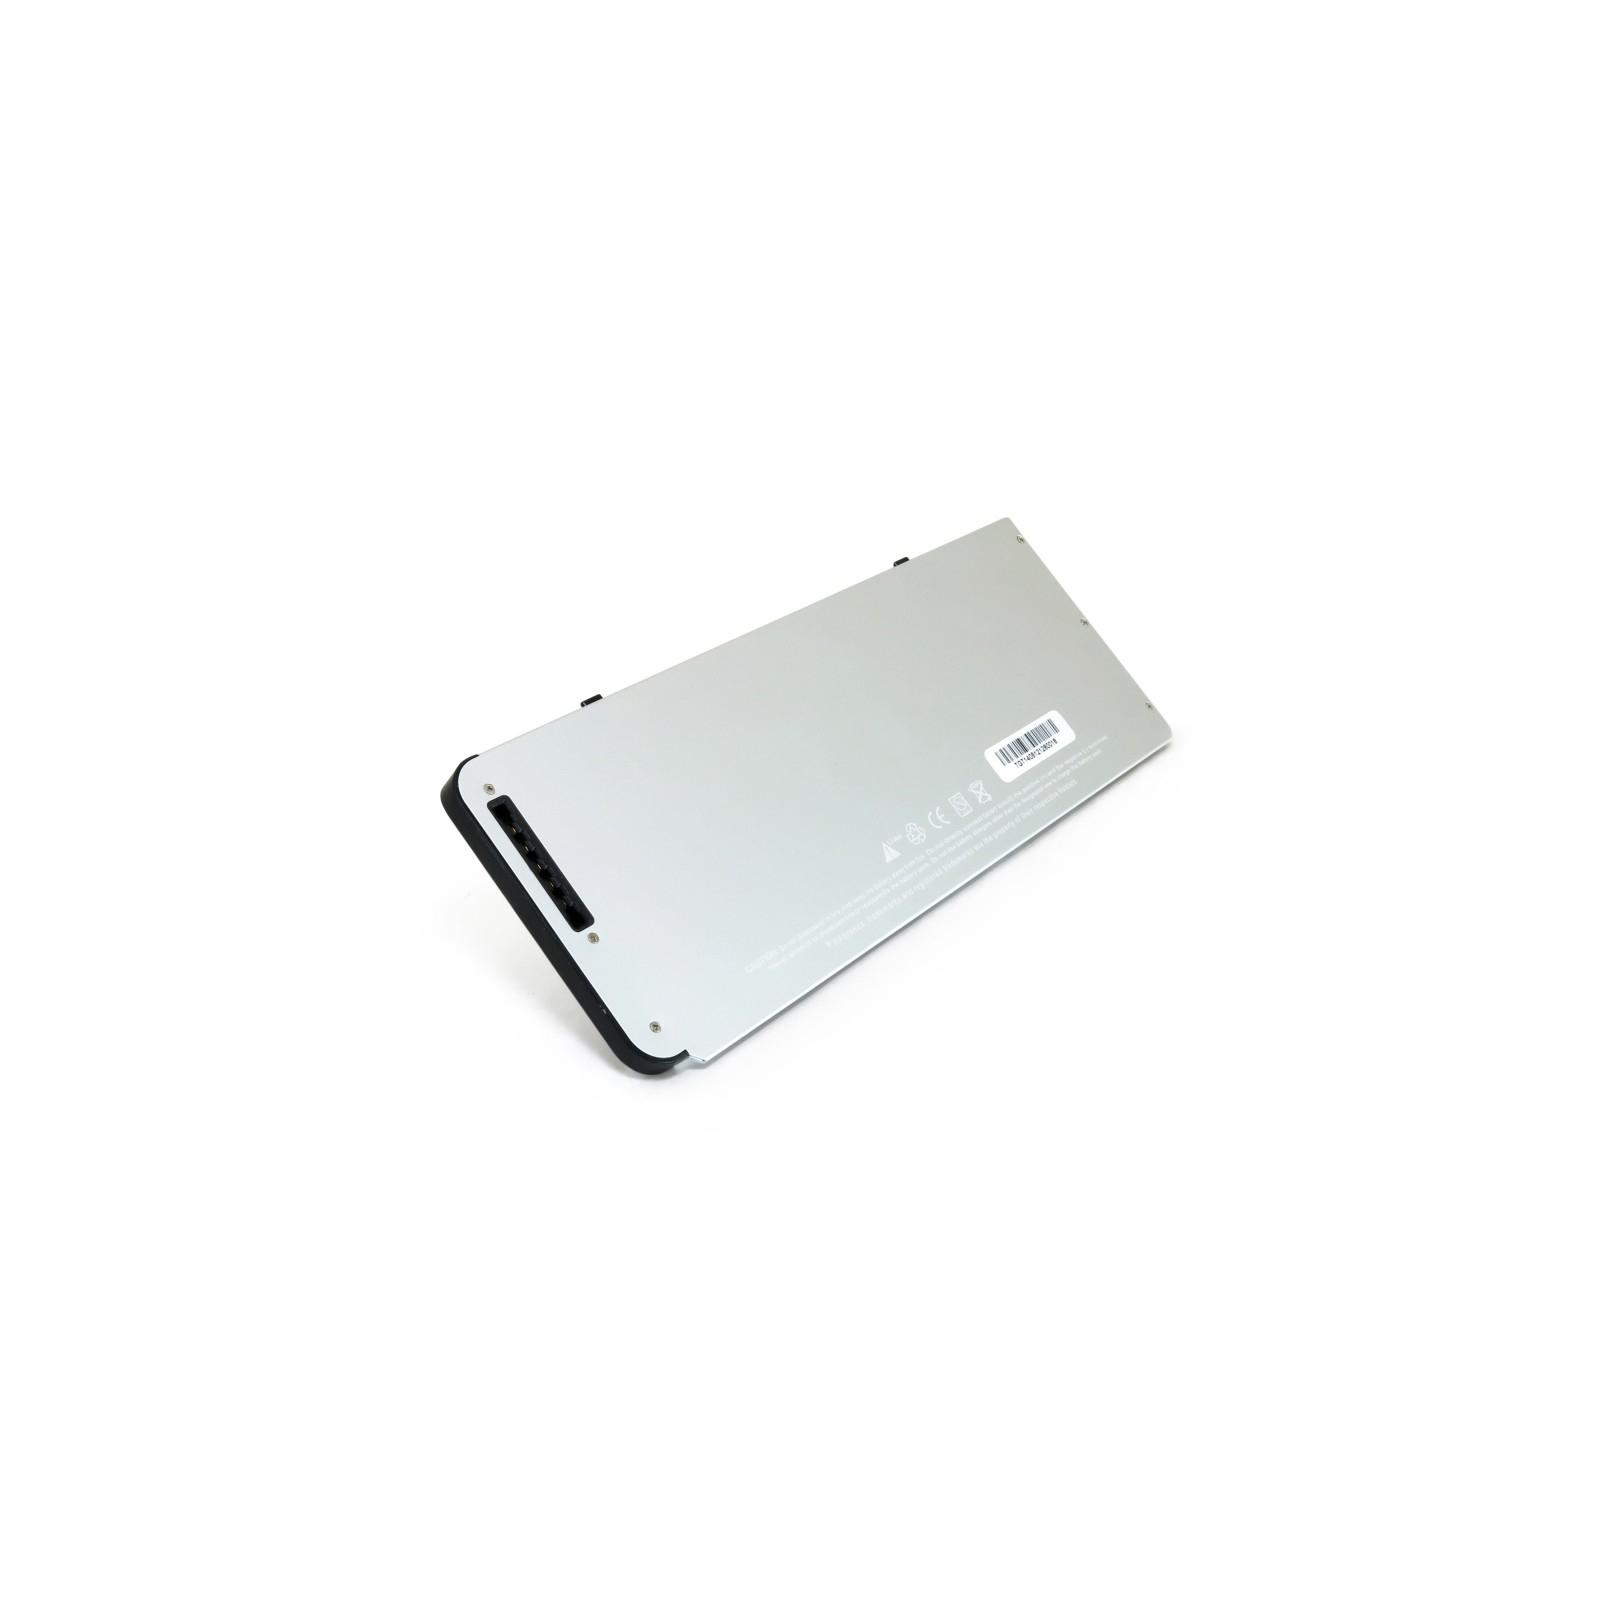 Аккумулятор для ноутбука APPLE A1280 (5000 mAh) EXTRADIGITAL (BNA3902)